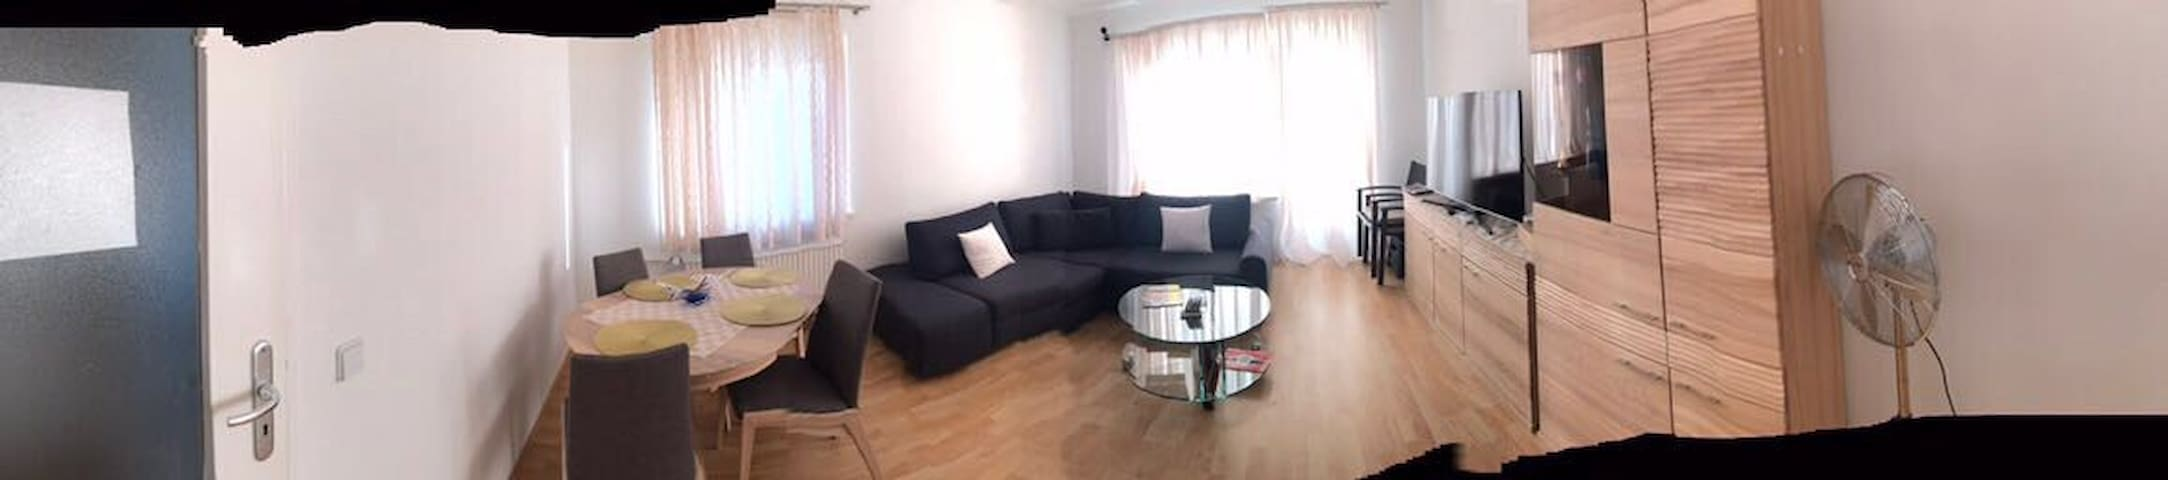 Quiet and bright condo in Rudow, Berlin for 4 - Berlin - Appartement en résidence